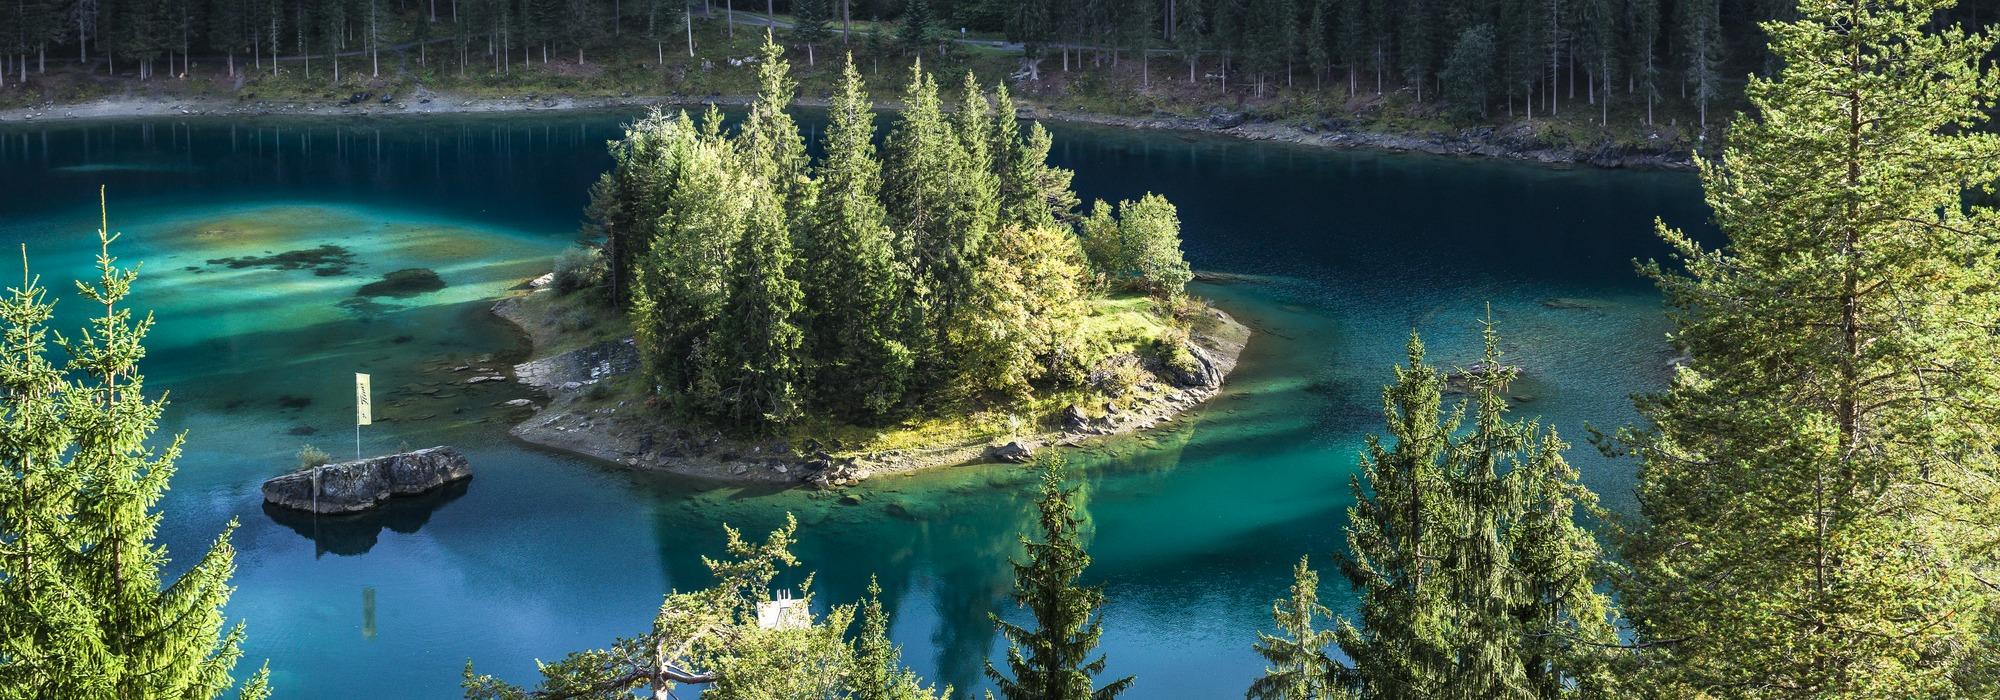 Türkis-Grüner See im Walde